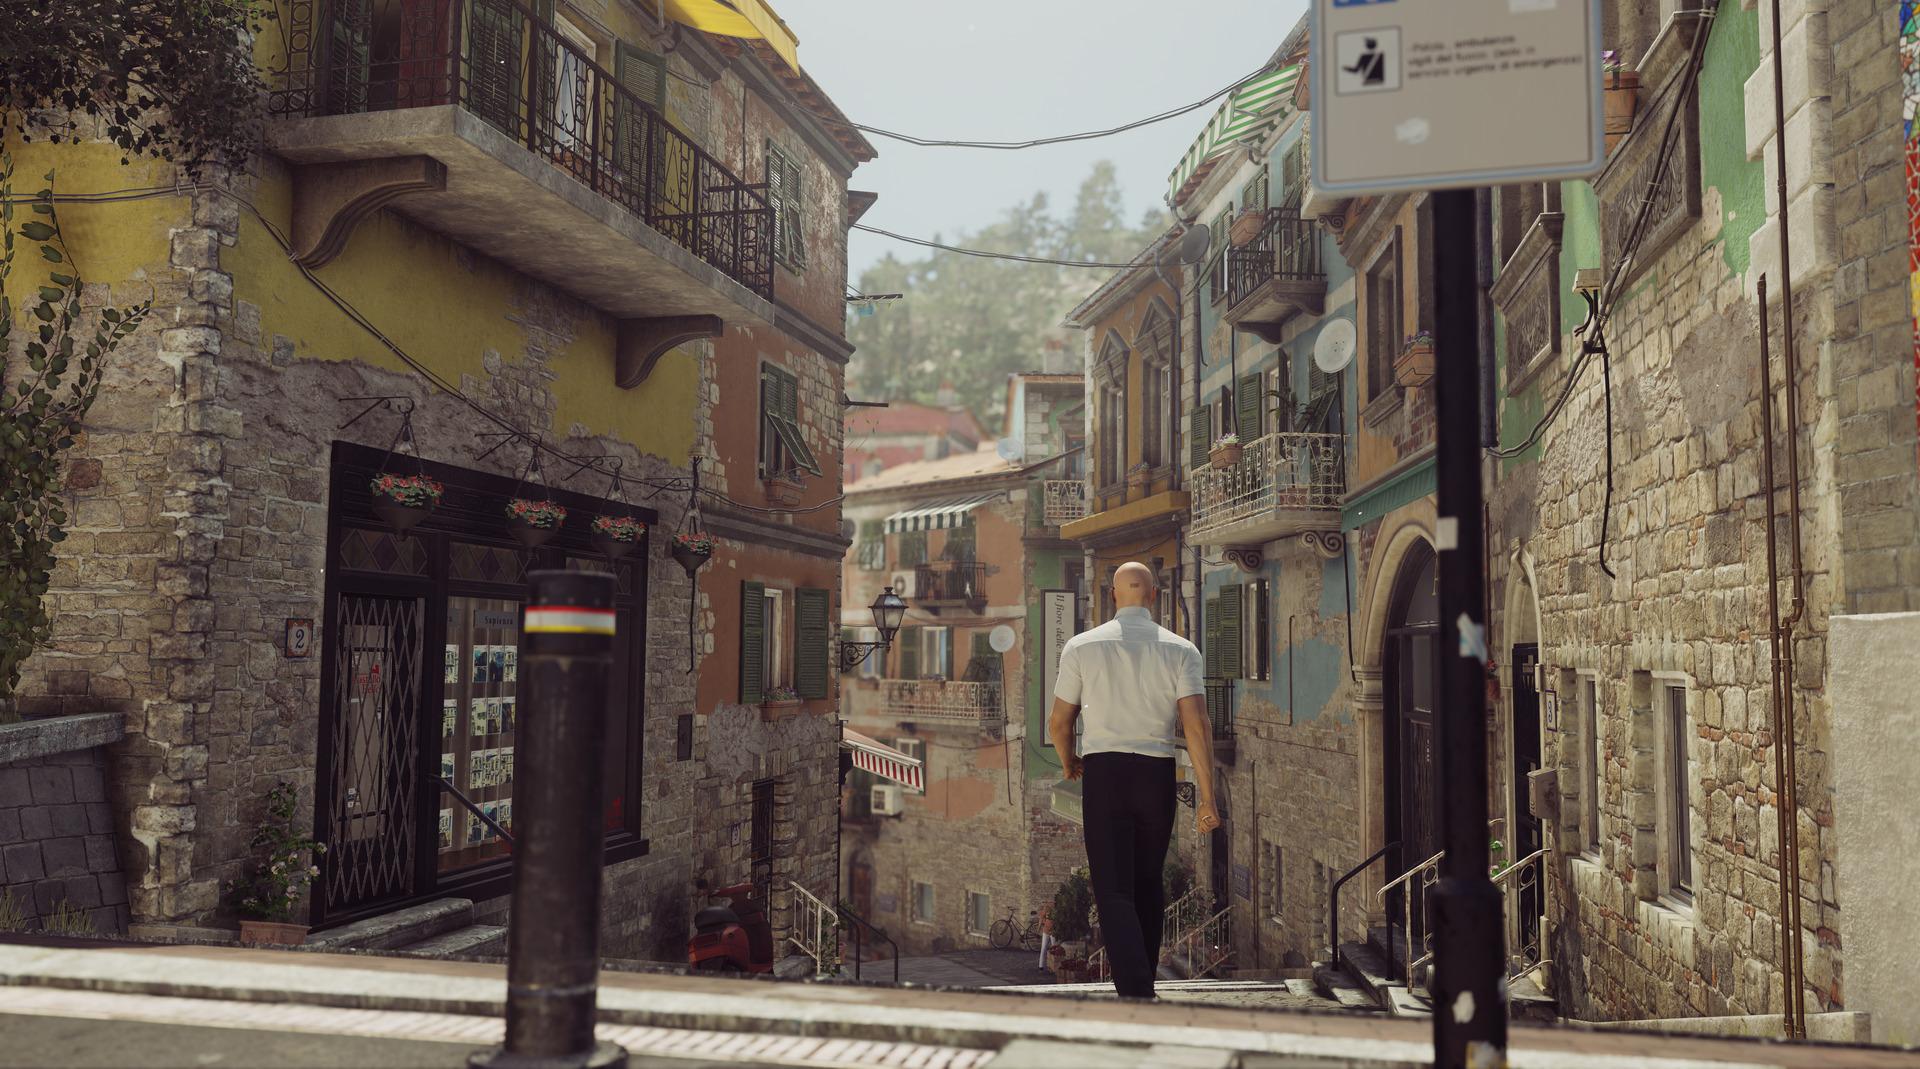 Italské město Sapienza z druhé epizody Hitmana 122558